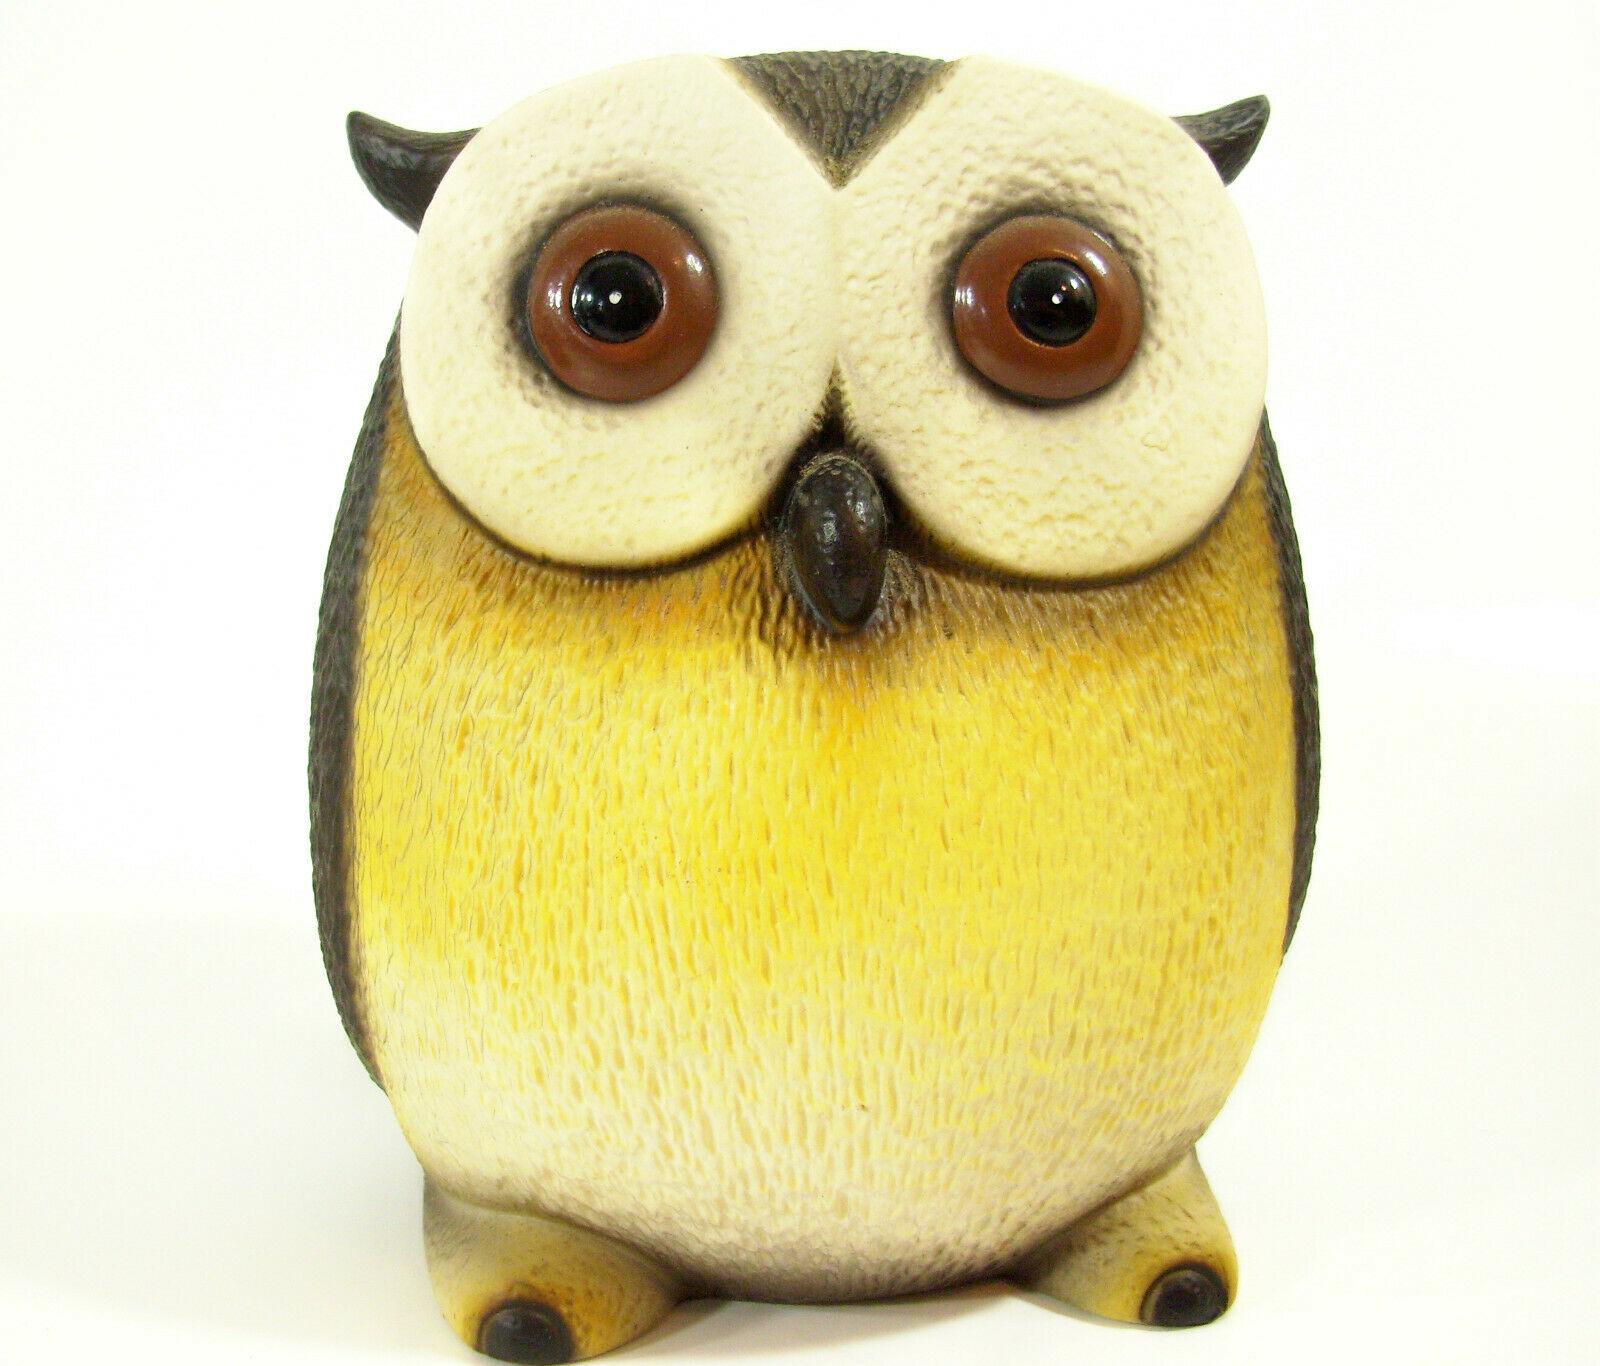 Harvey Knox Kingdom Owl Hand Painted Figurine Figure House Global Art Japan